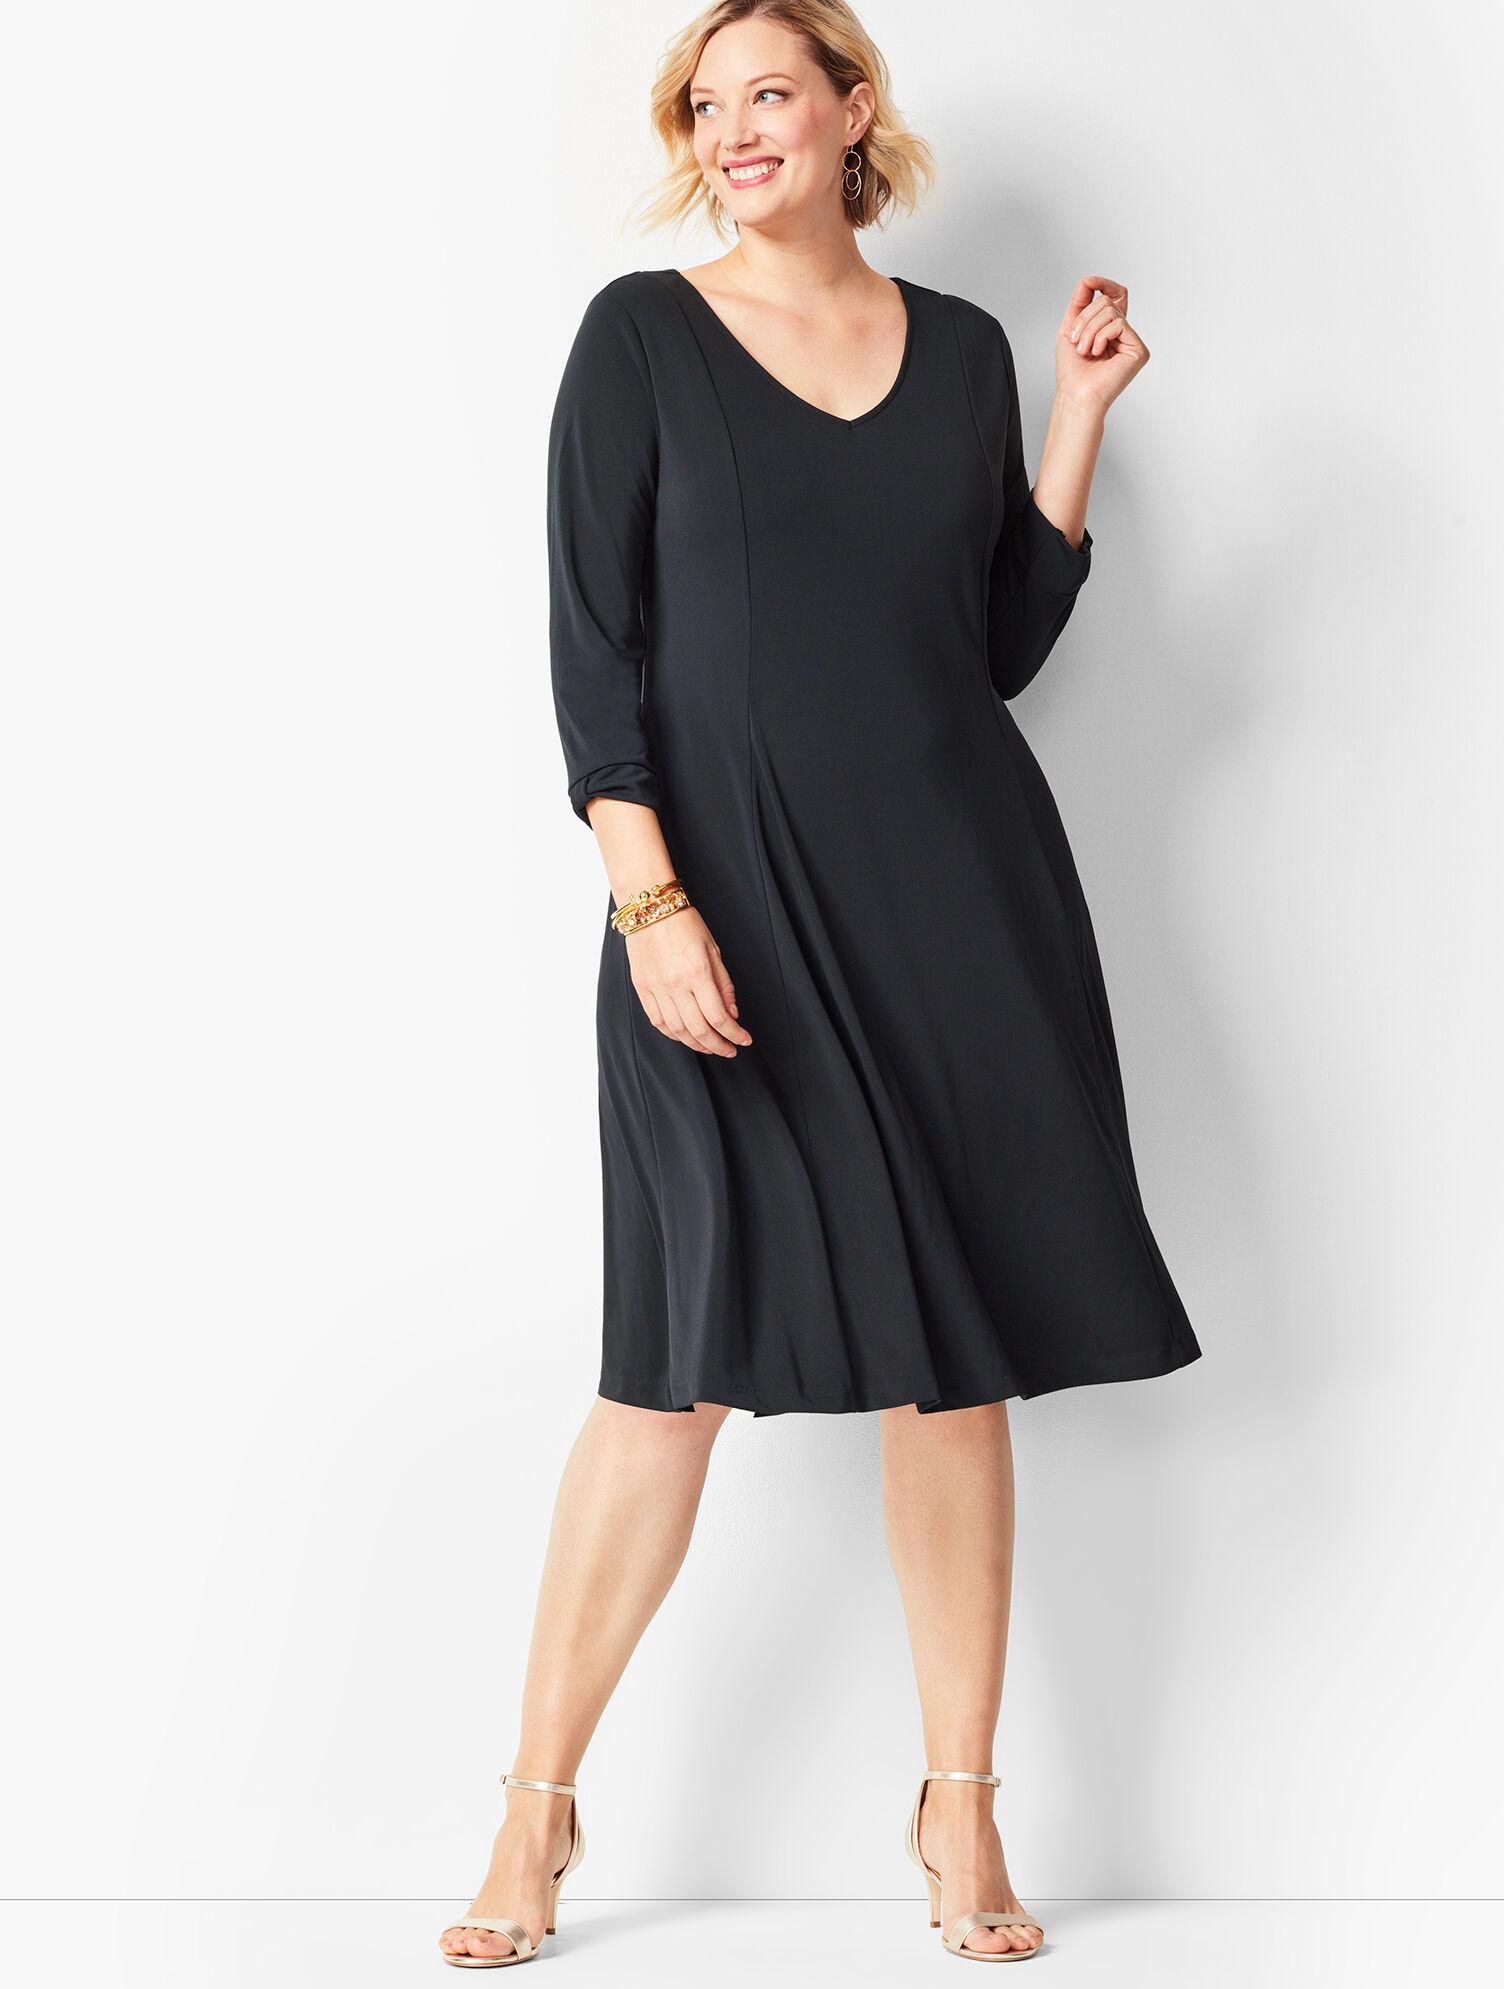 Talbots Plus Size Dresses